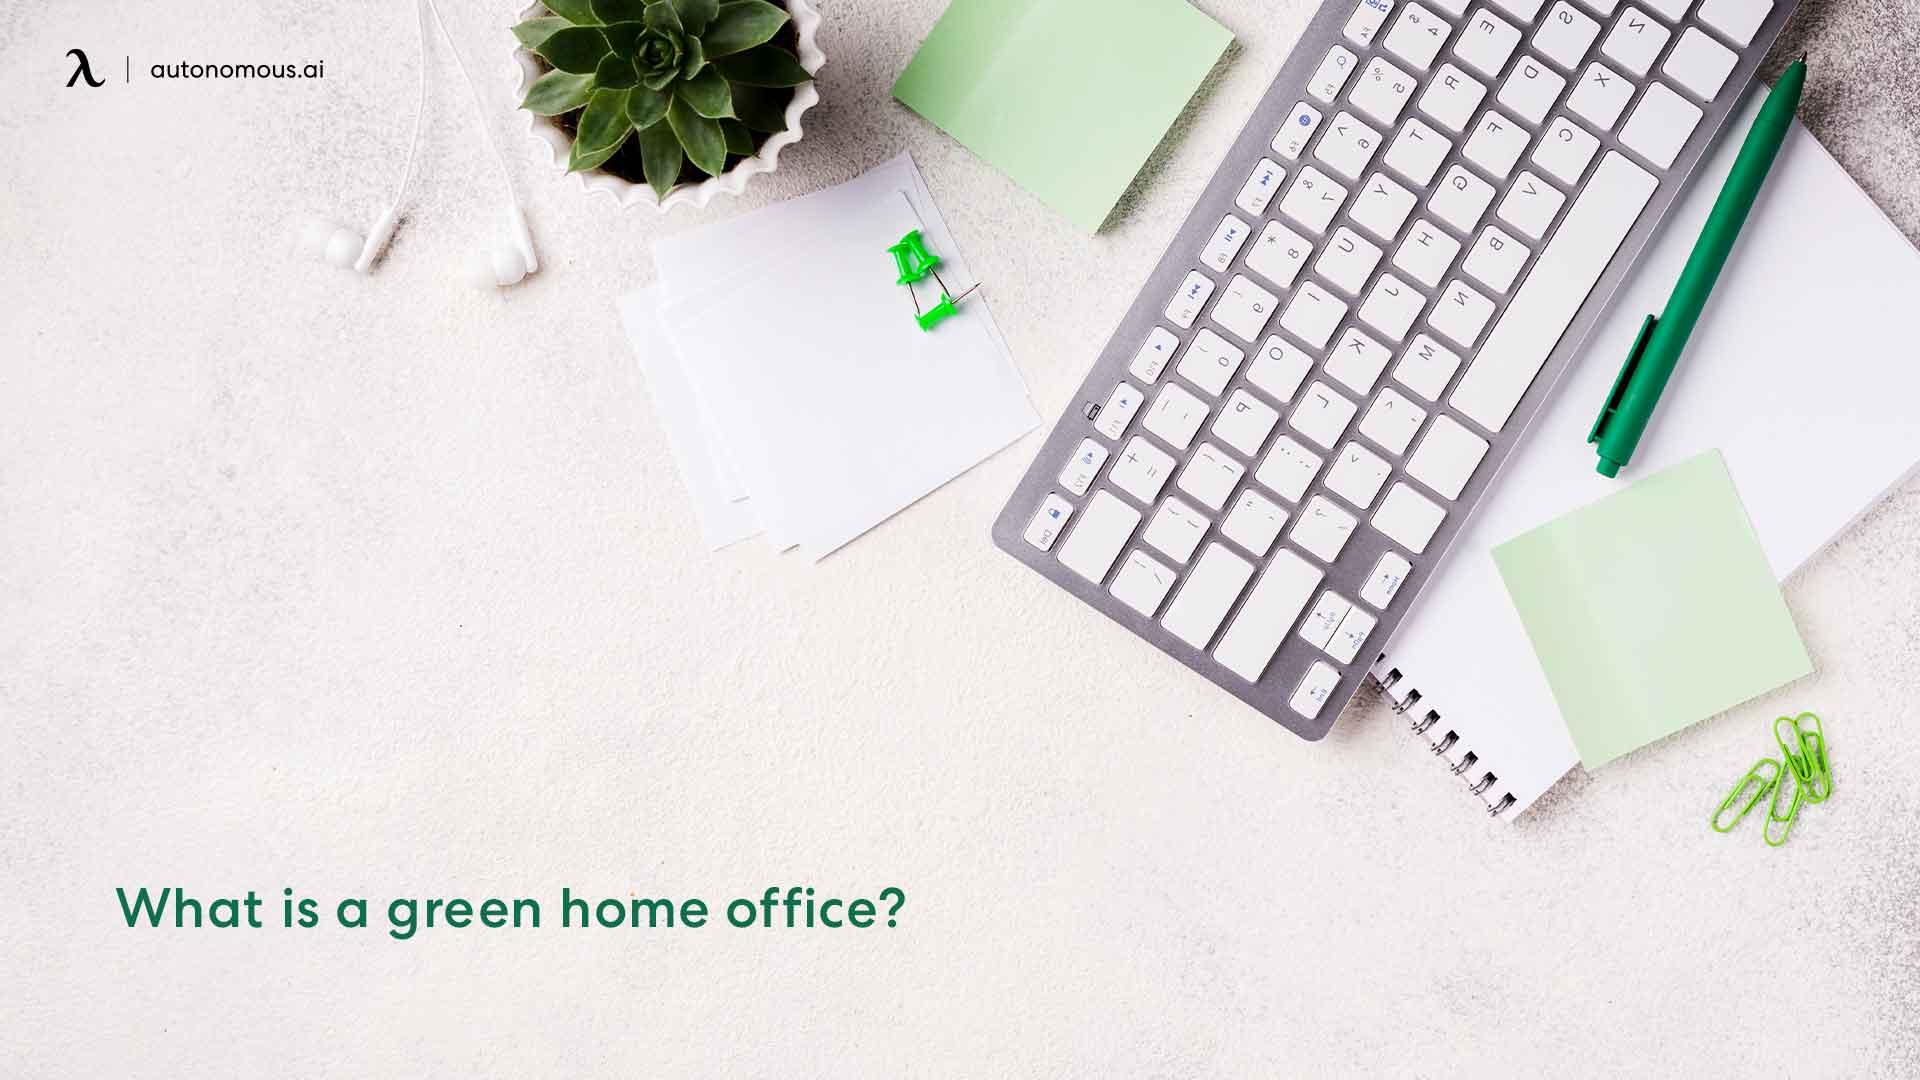 Setup green home office